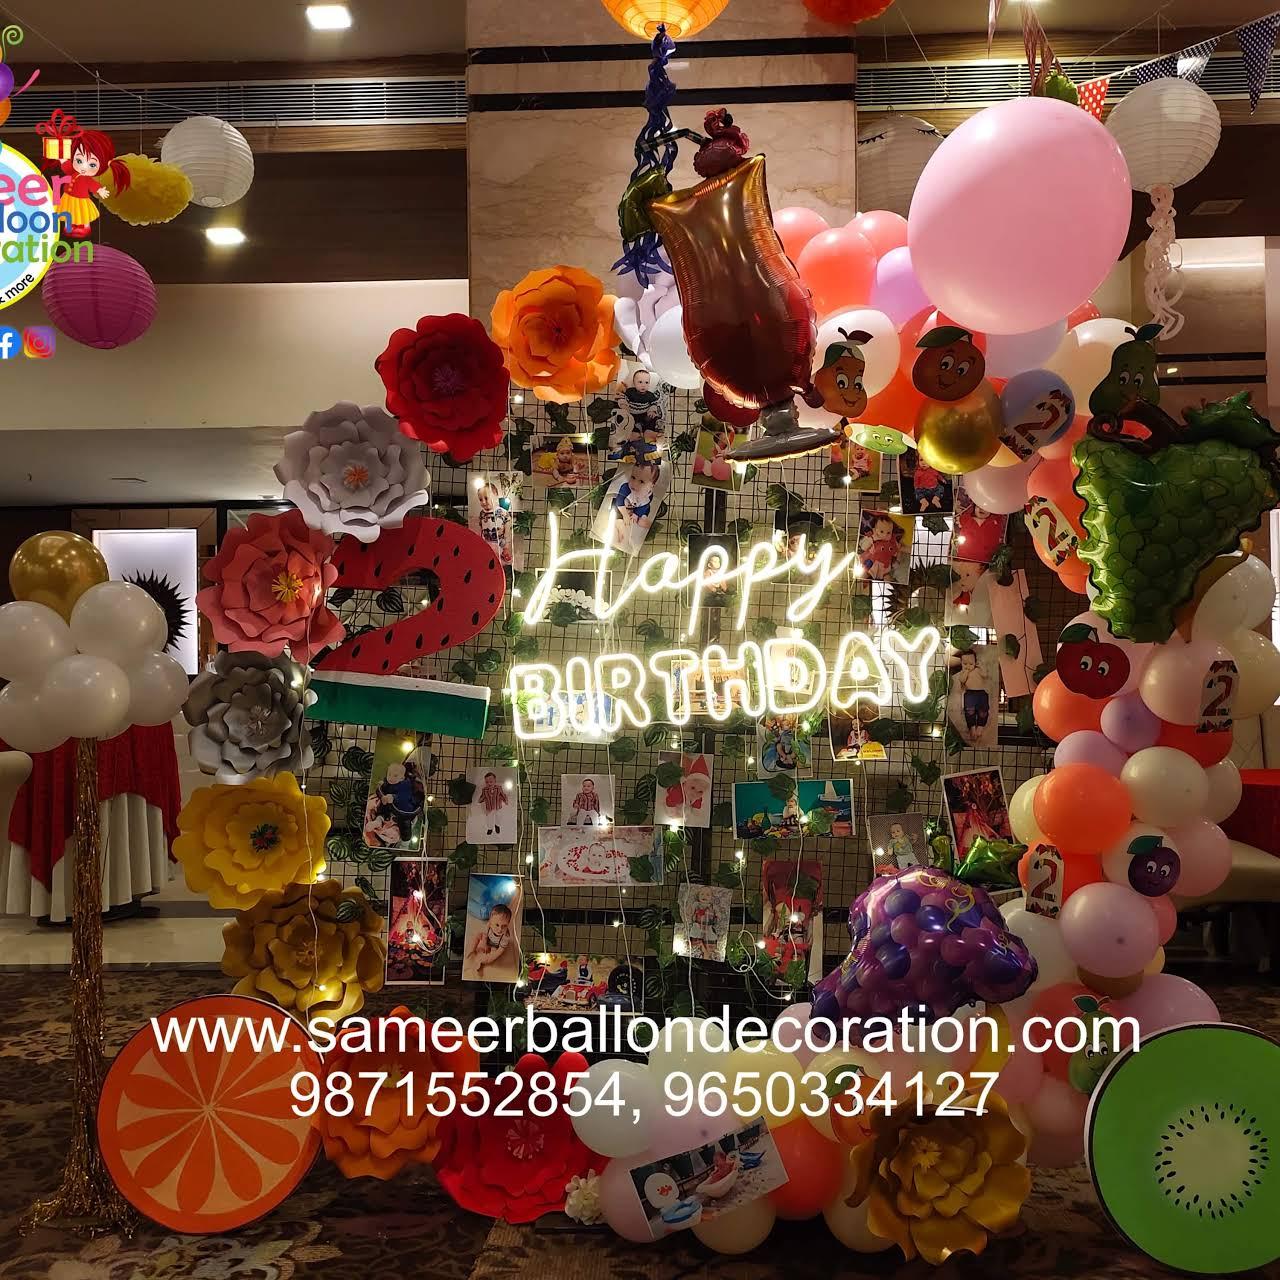 Sameer Balloon Decoration